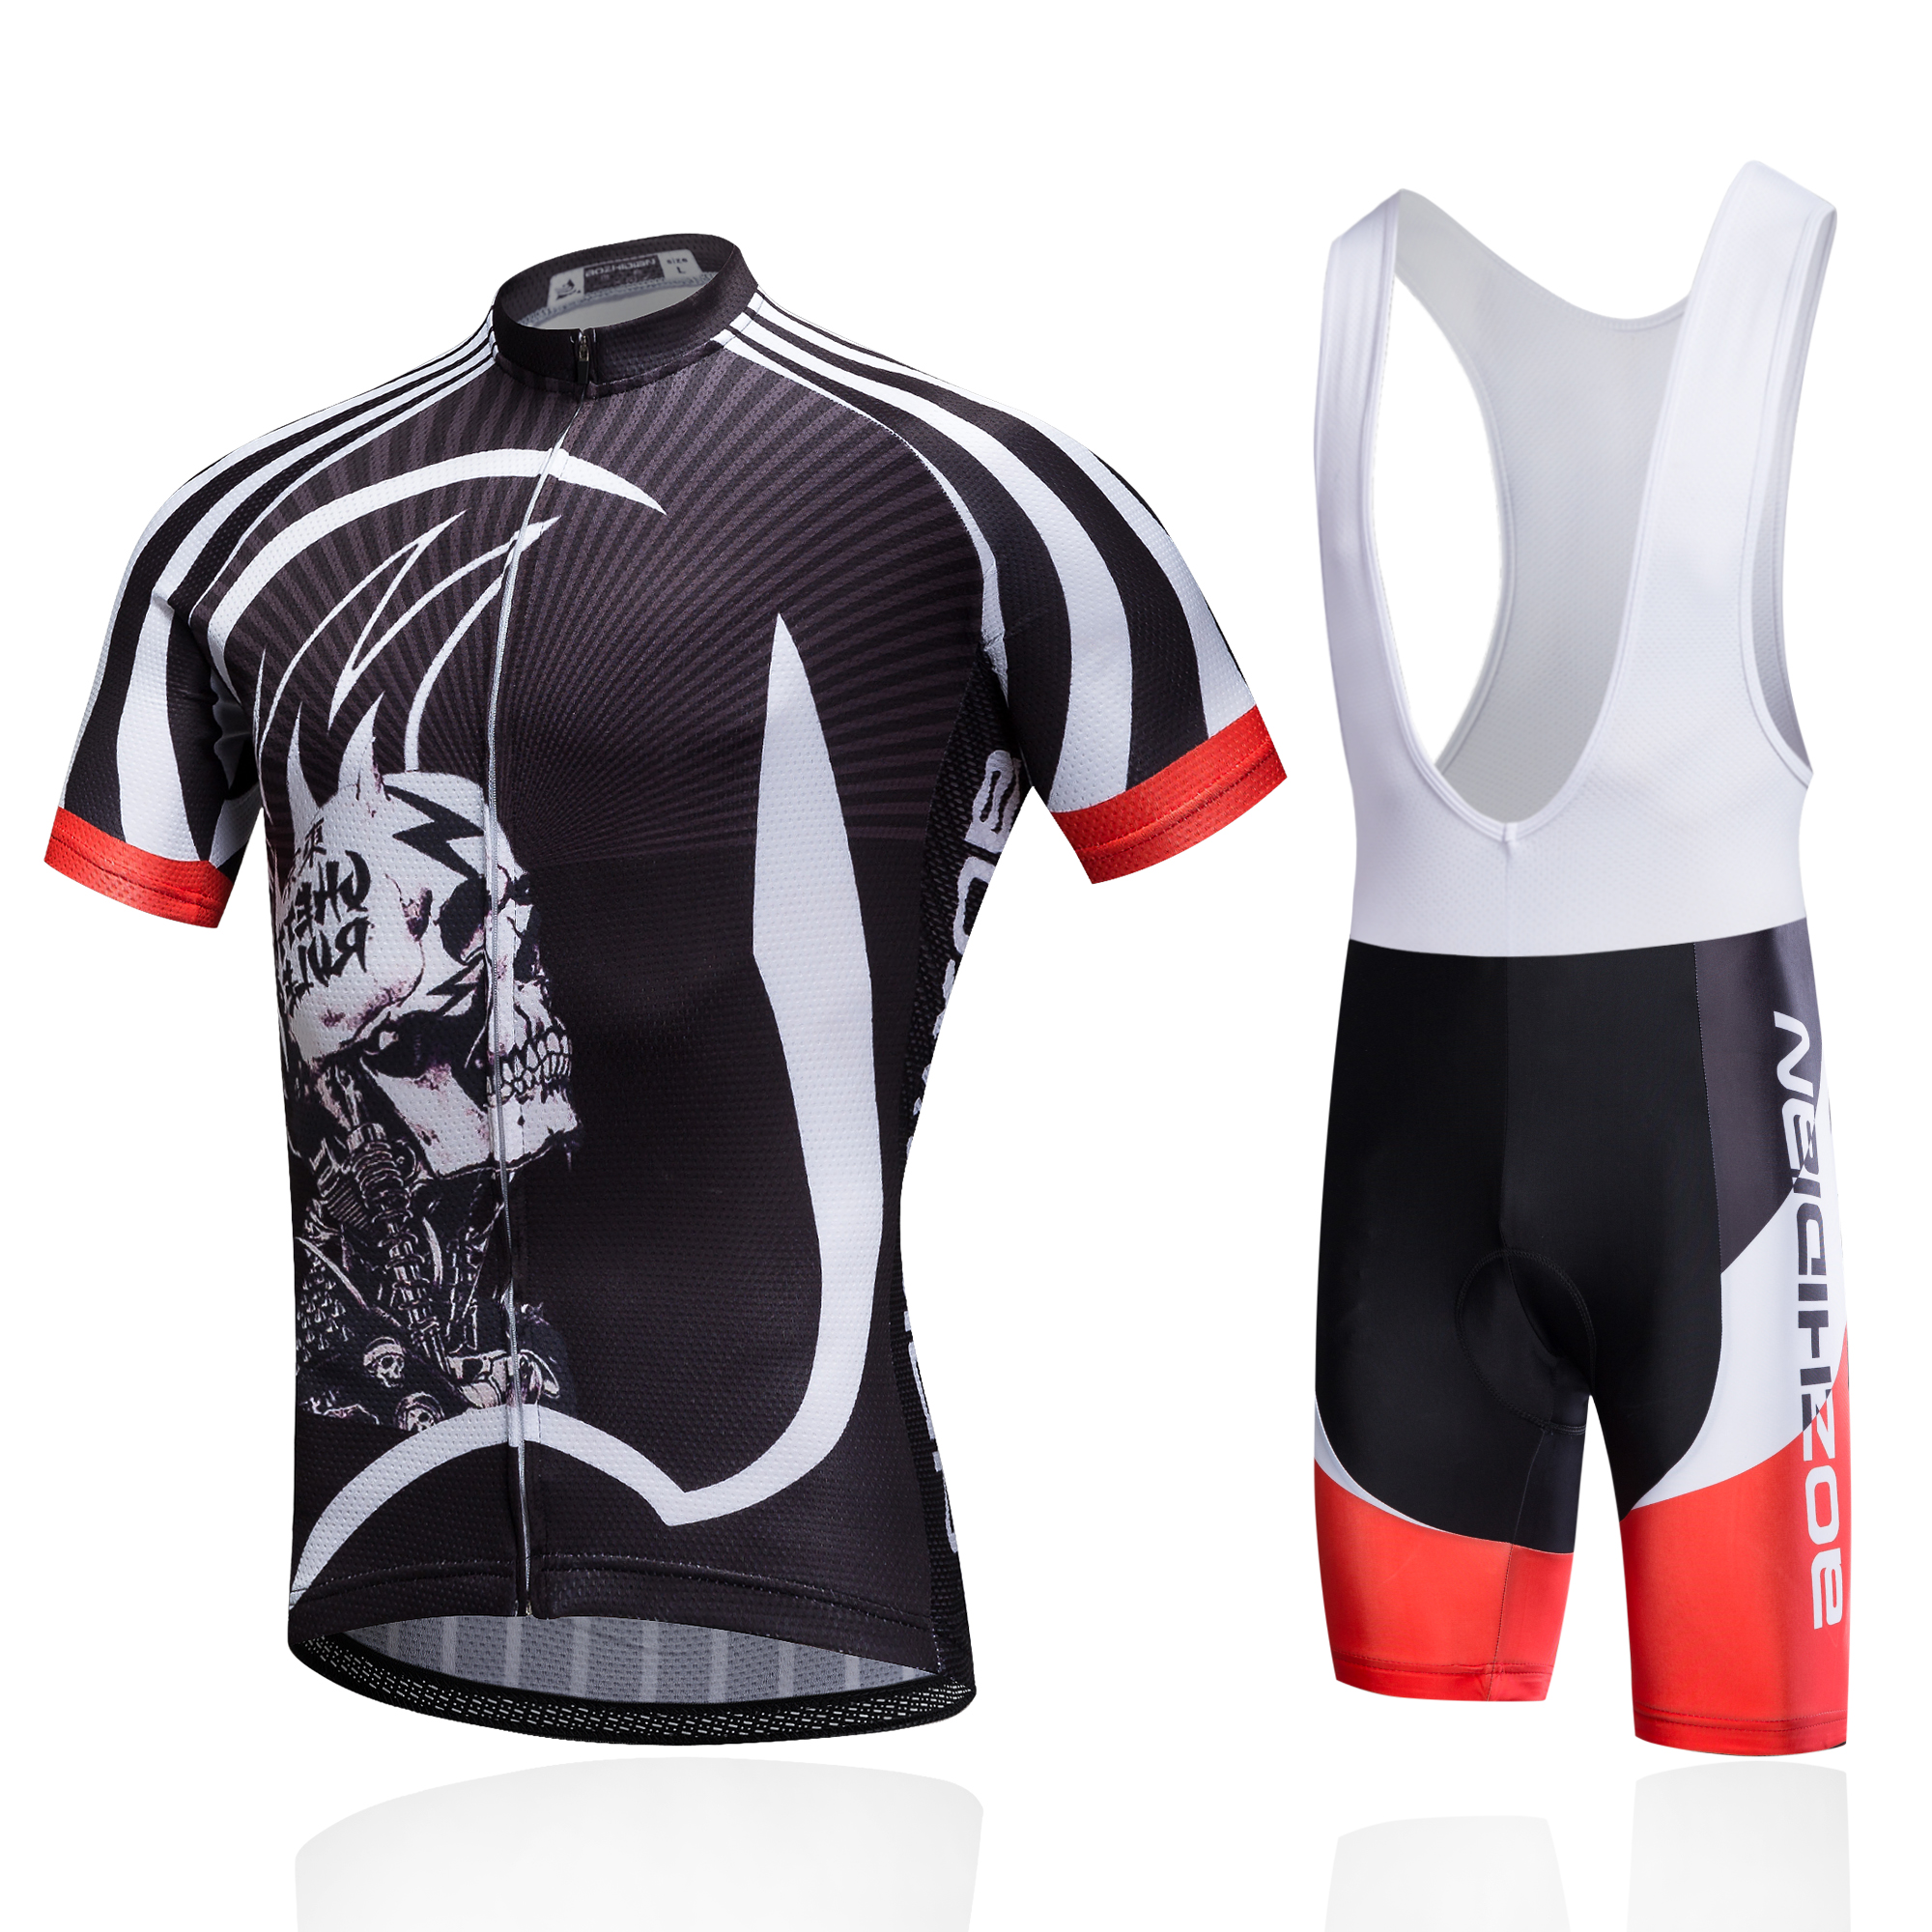 Summer Cycling Jersey Short Sleeve Cycling Clothing Road ...